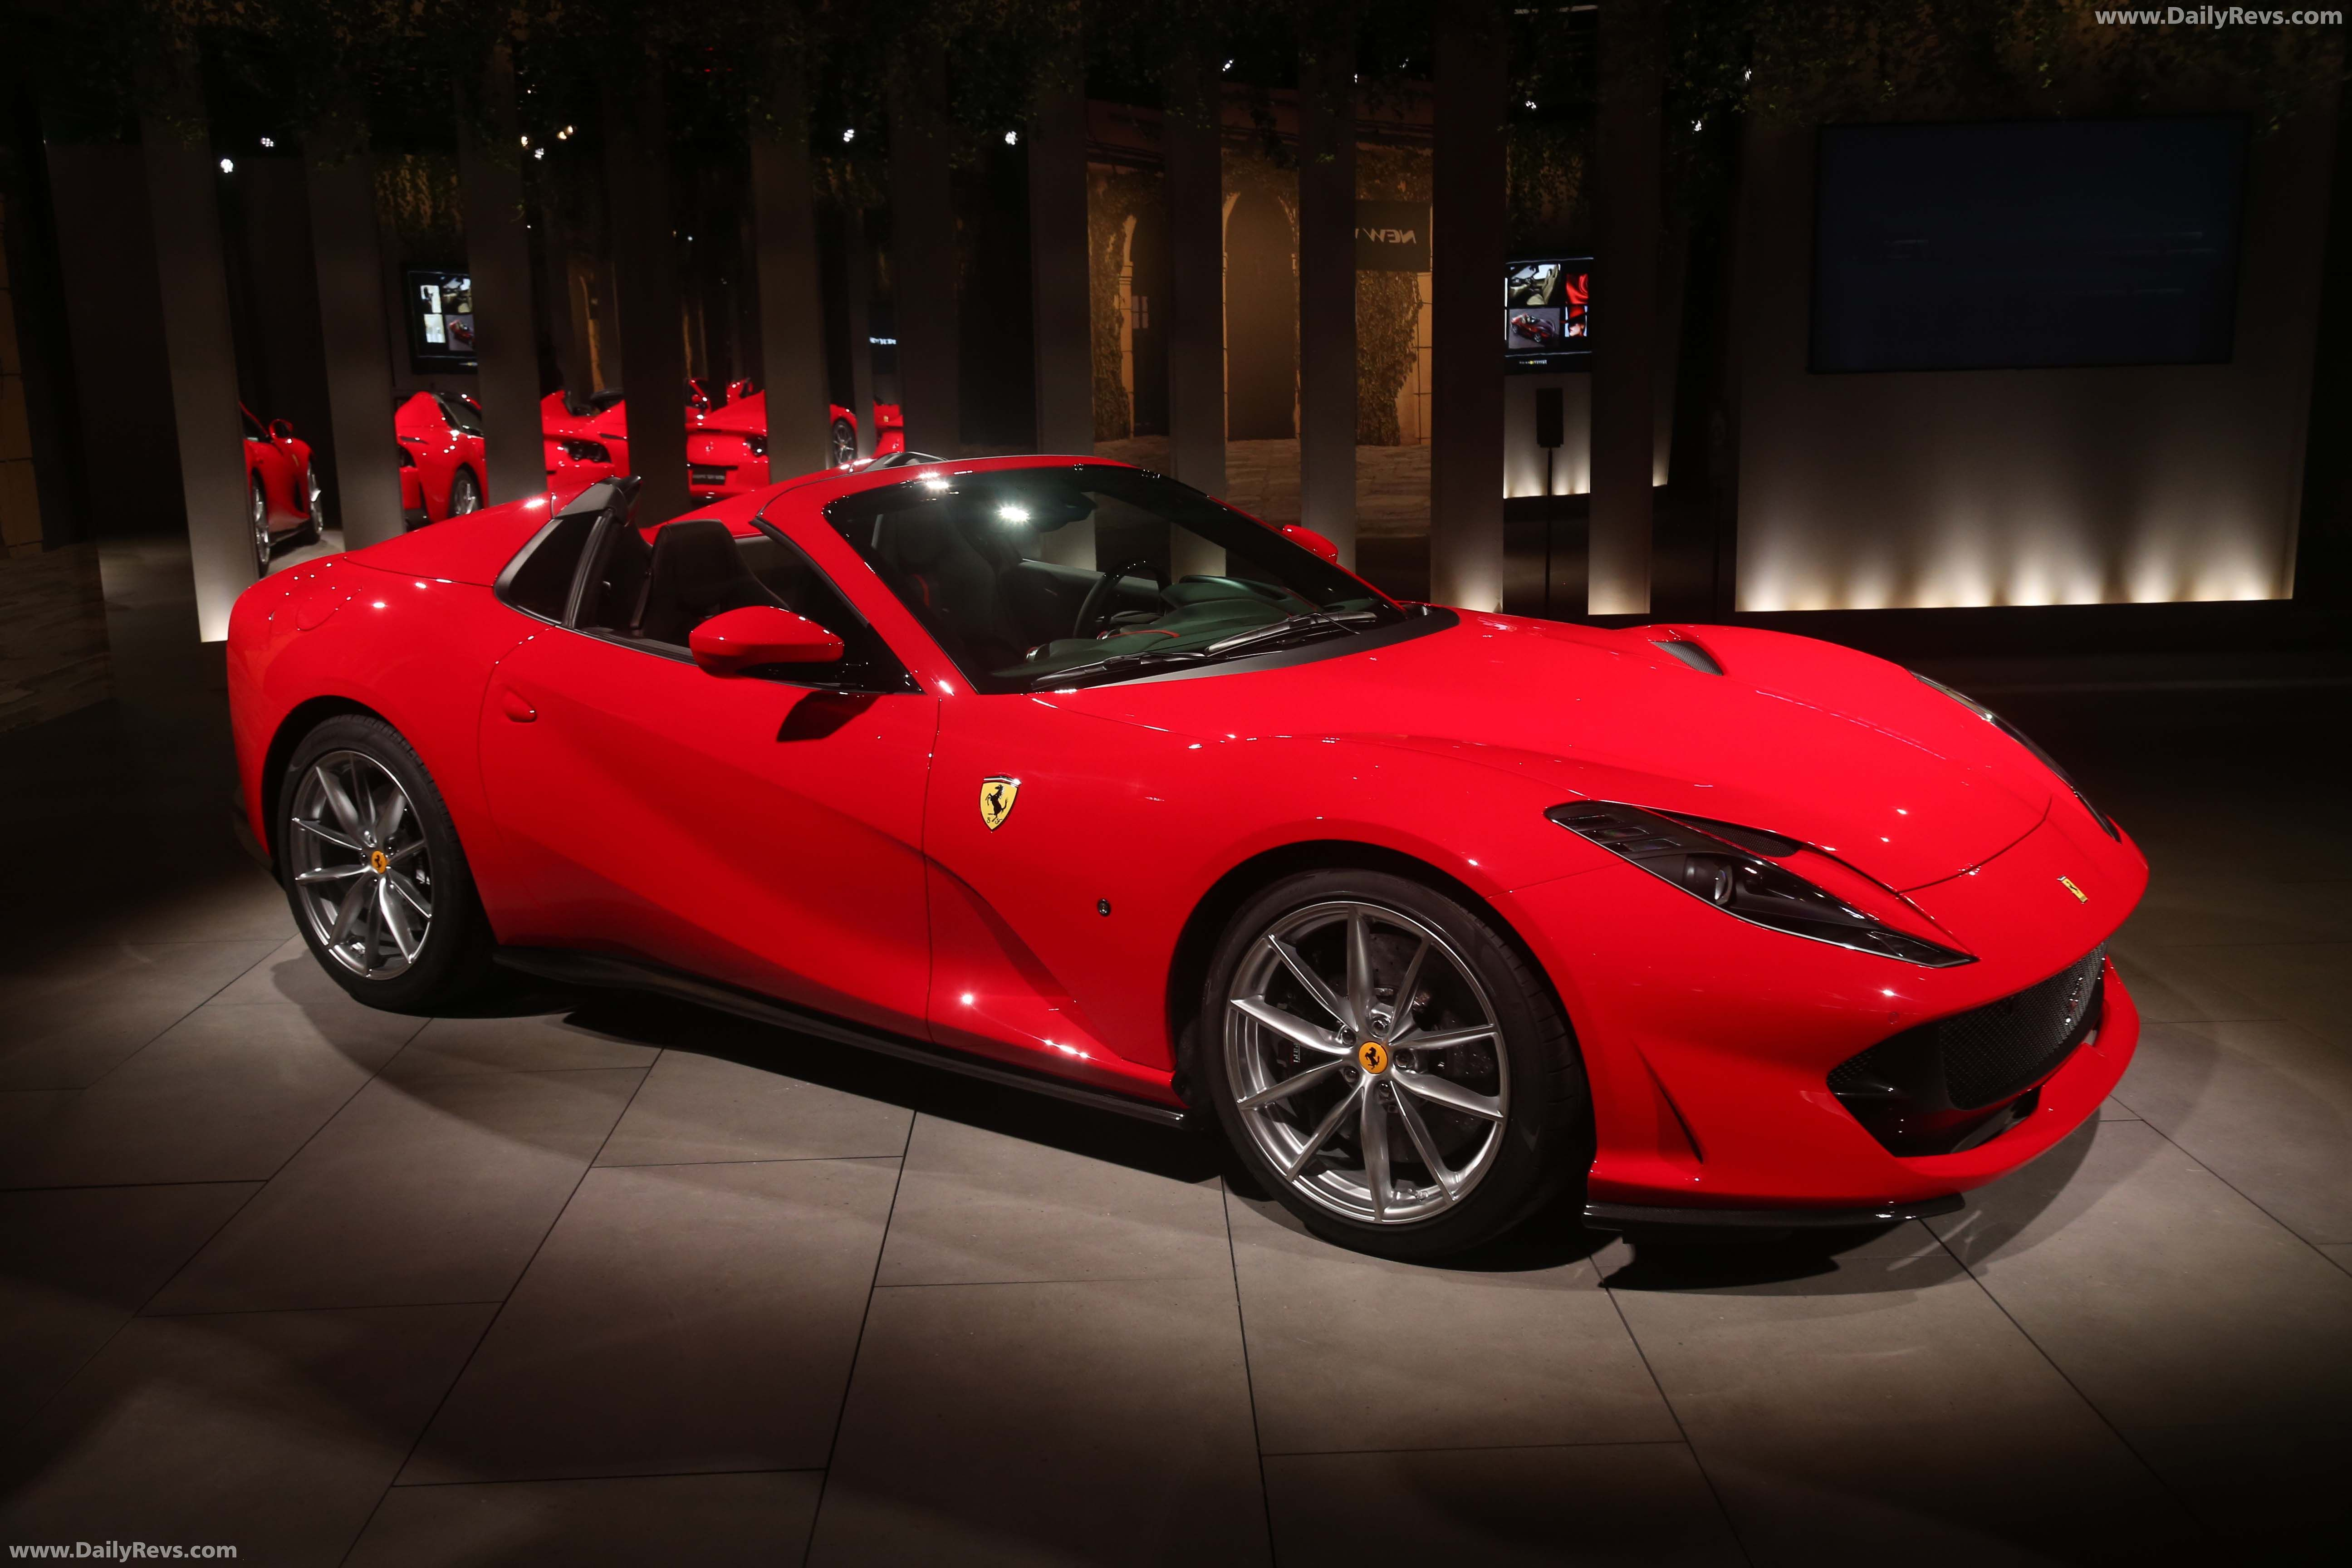 2020 Ferrari 812 Gts Hq Pictures Specs Information And Videos Dailyrevs In 2020 Ferrari Good Looking Cars La Ferrari